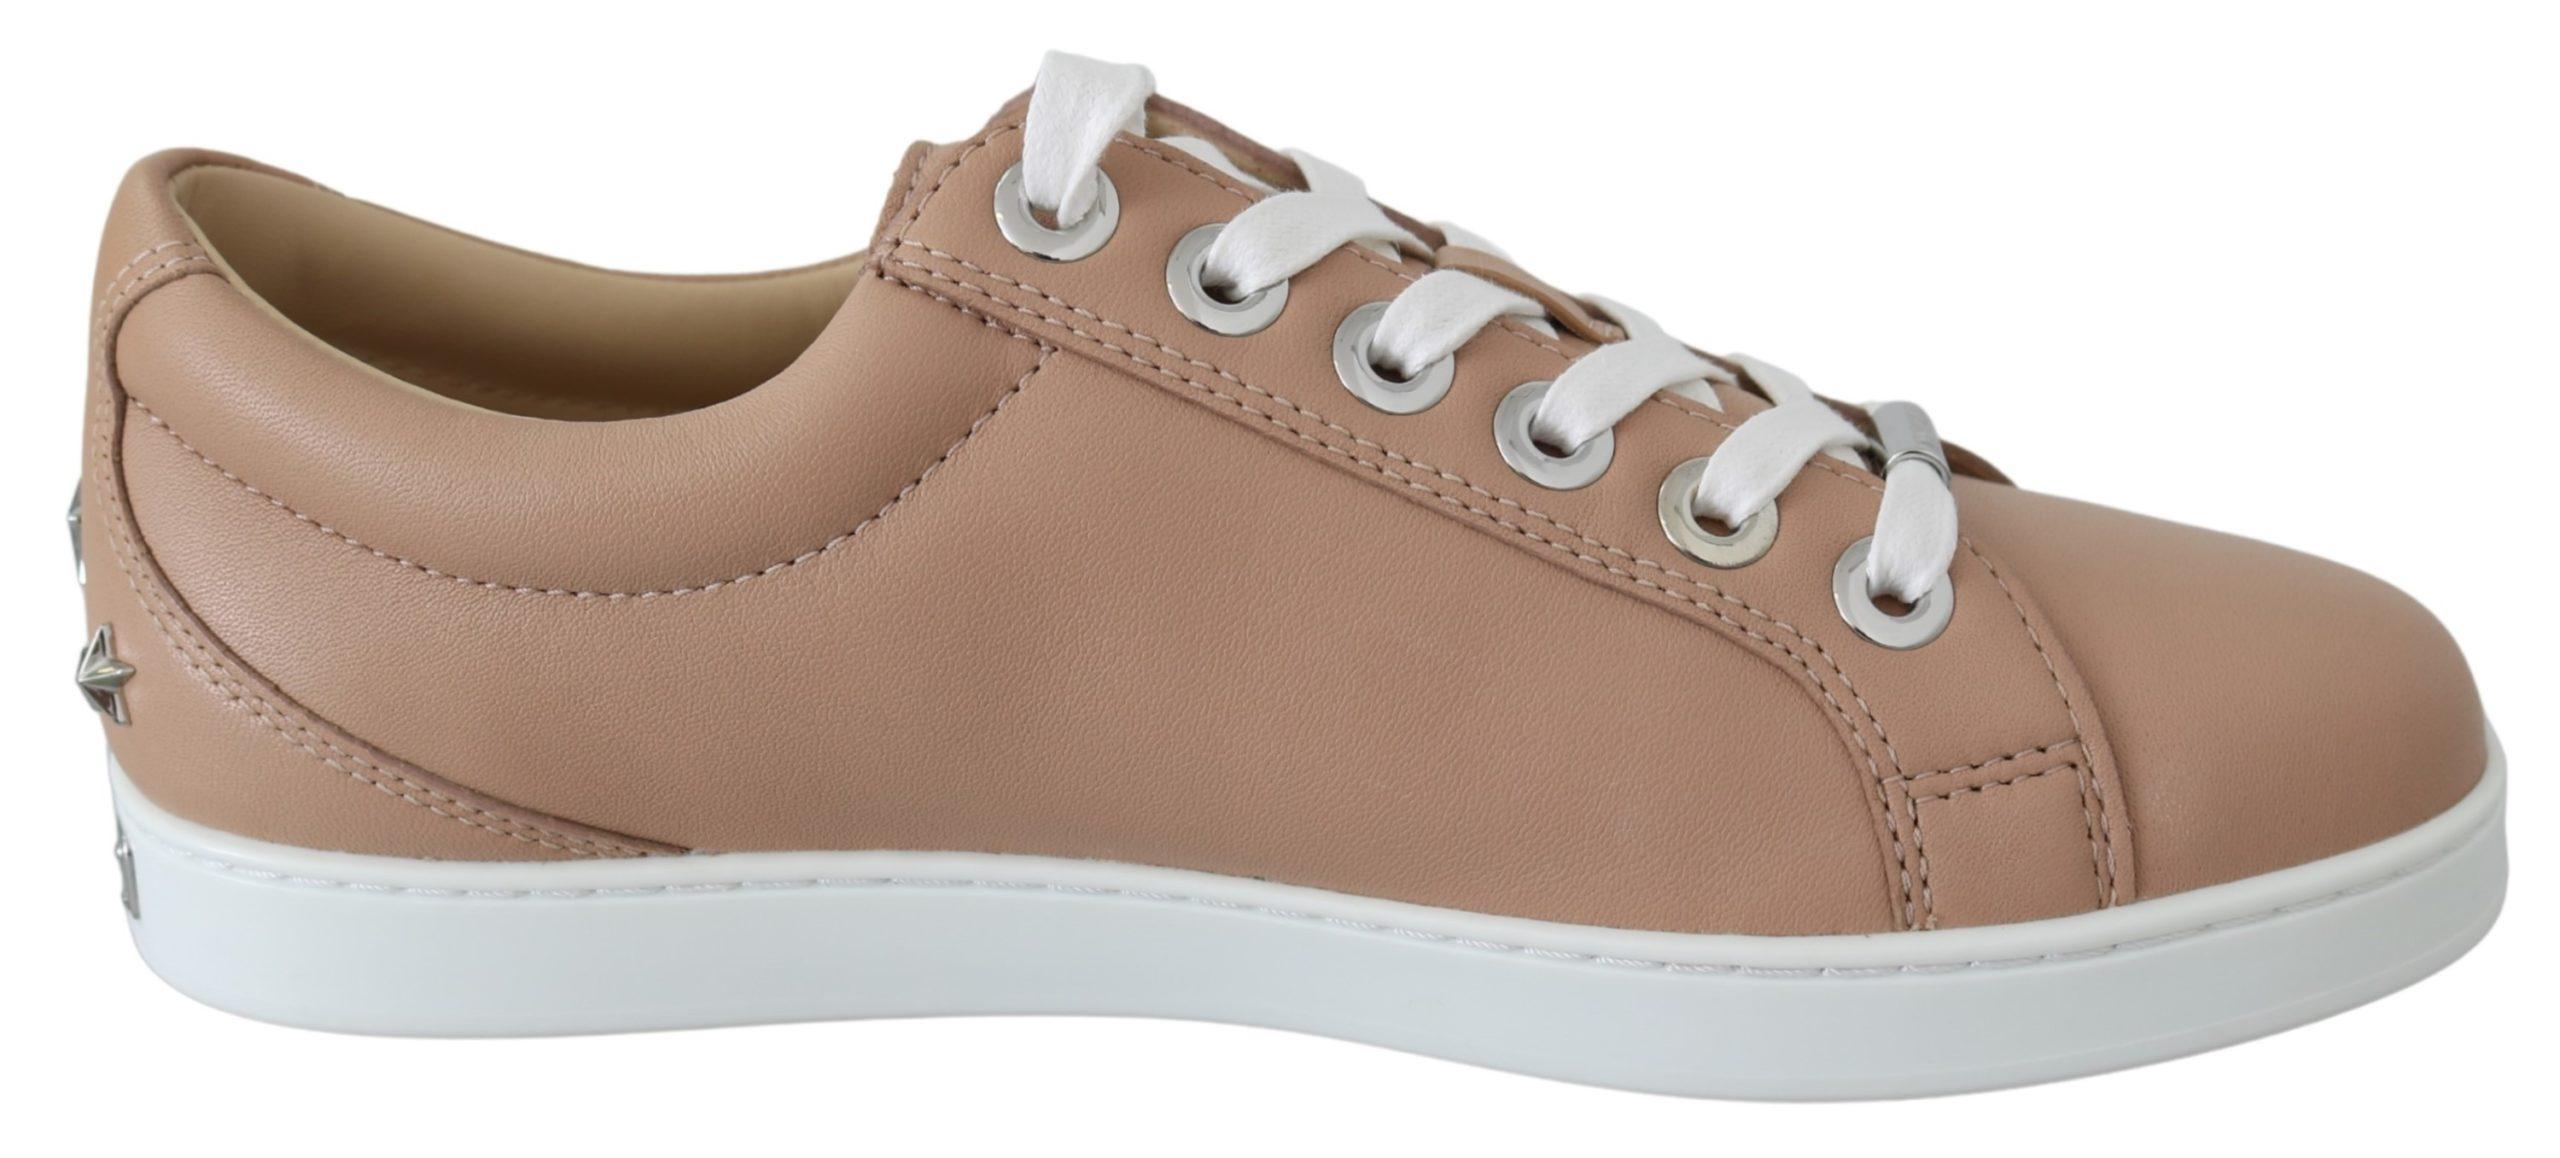 Jimmy Choos Womens's Cash Sneakers Powder Pink 194611096580 - EU37/US7